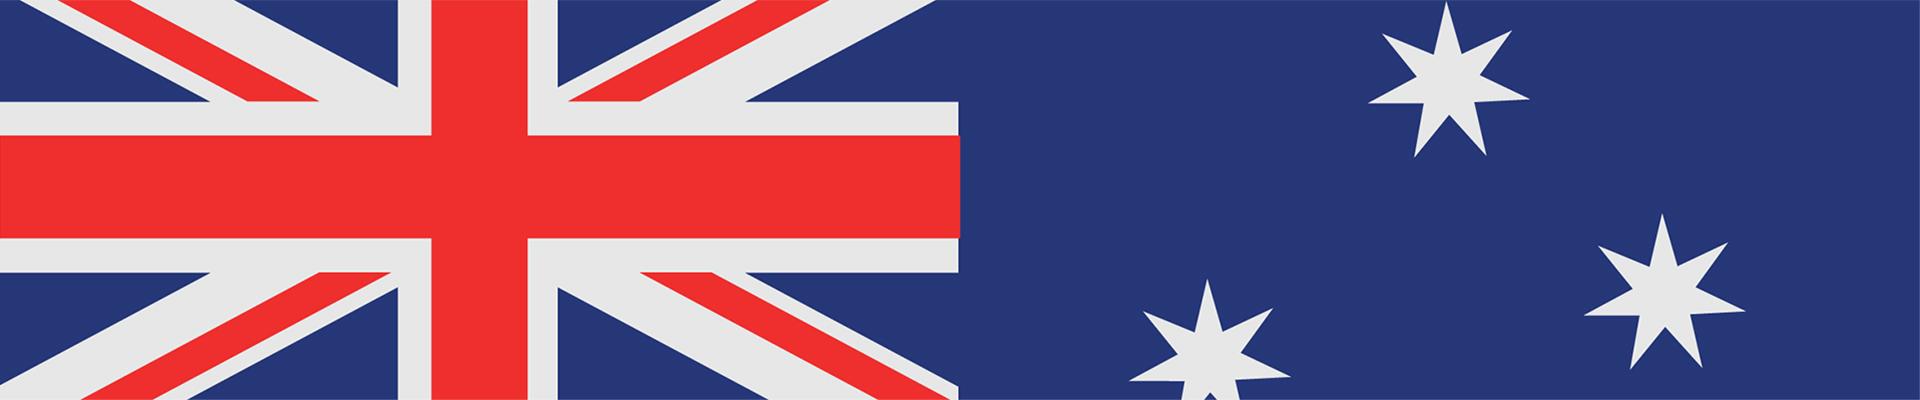 Floyd Mayweather vs Logan Paul live streams in Australia